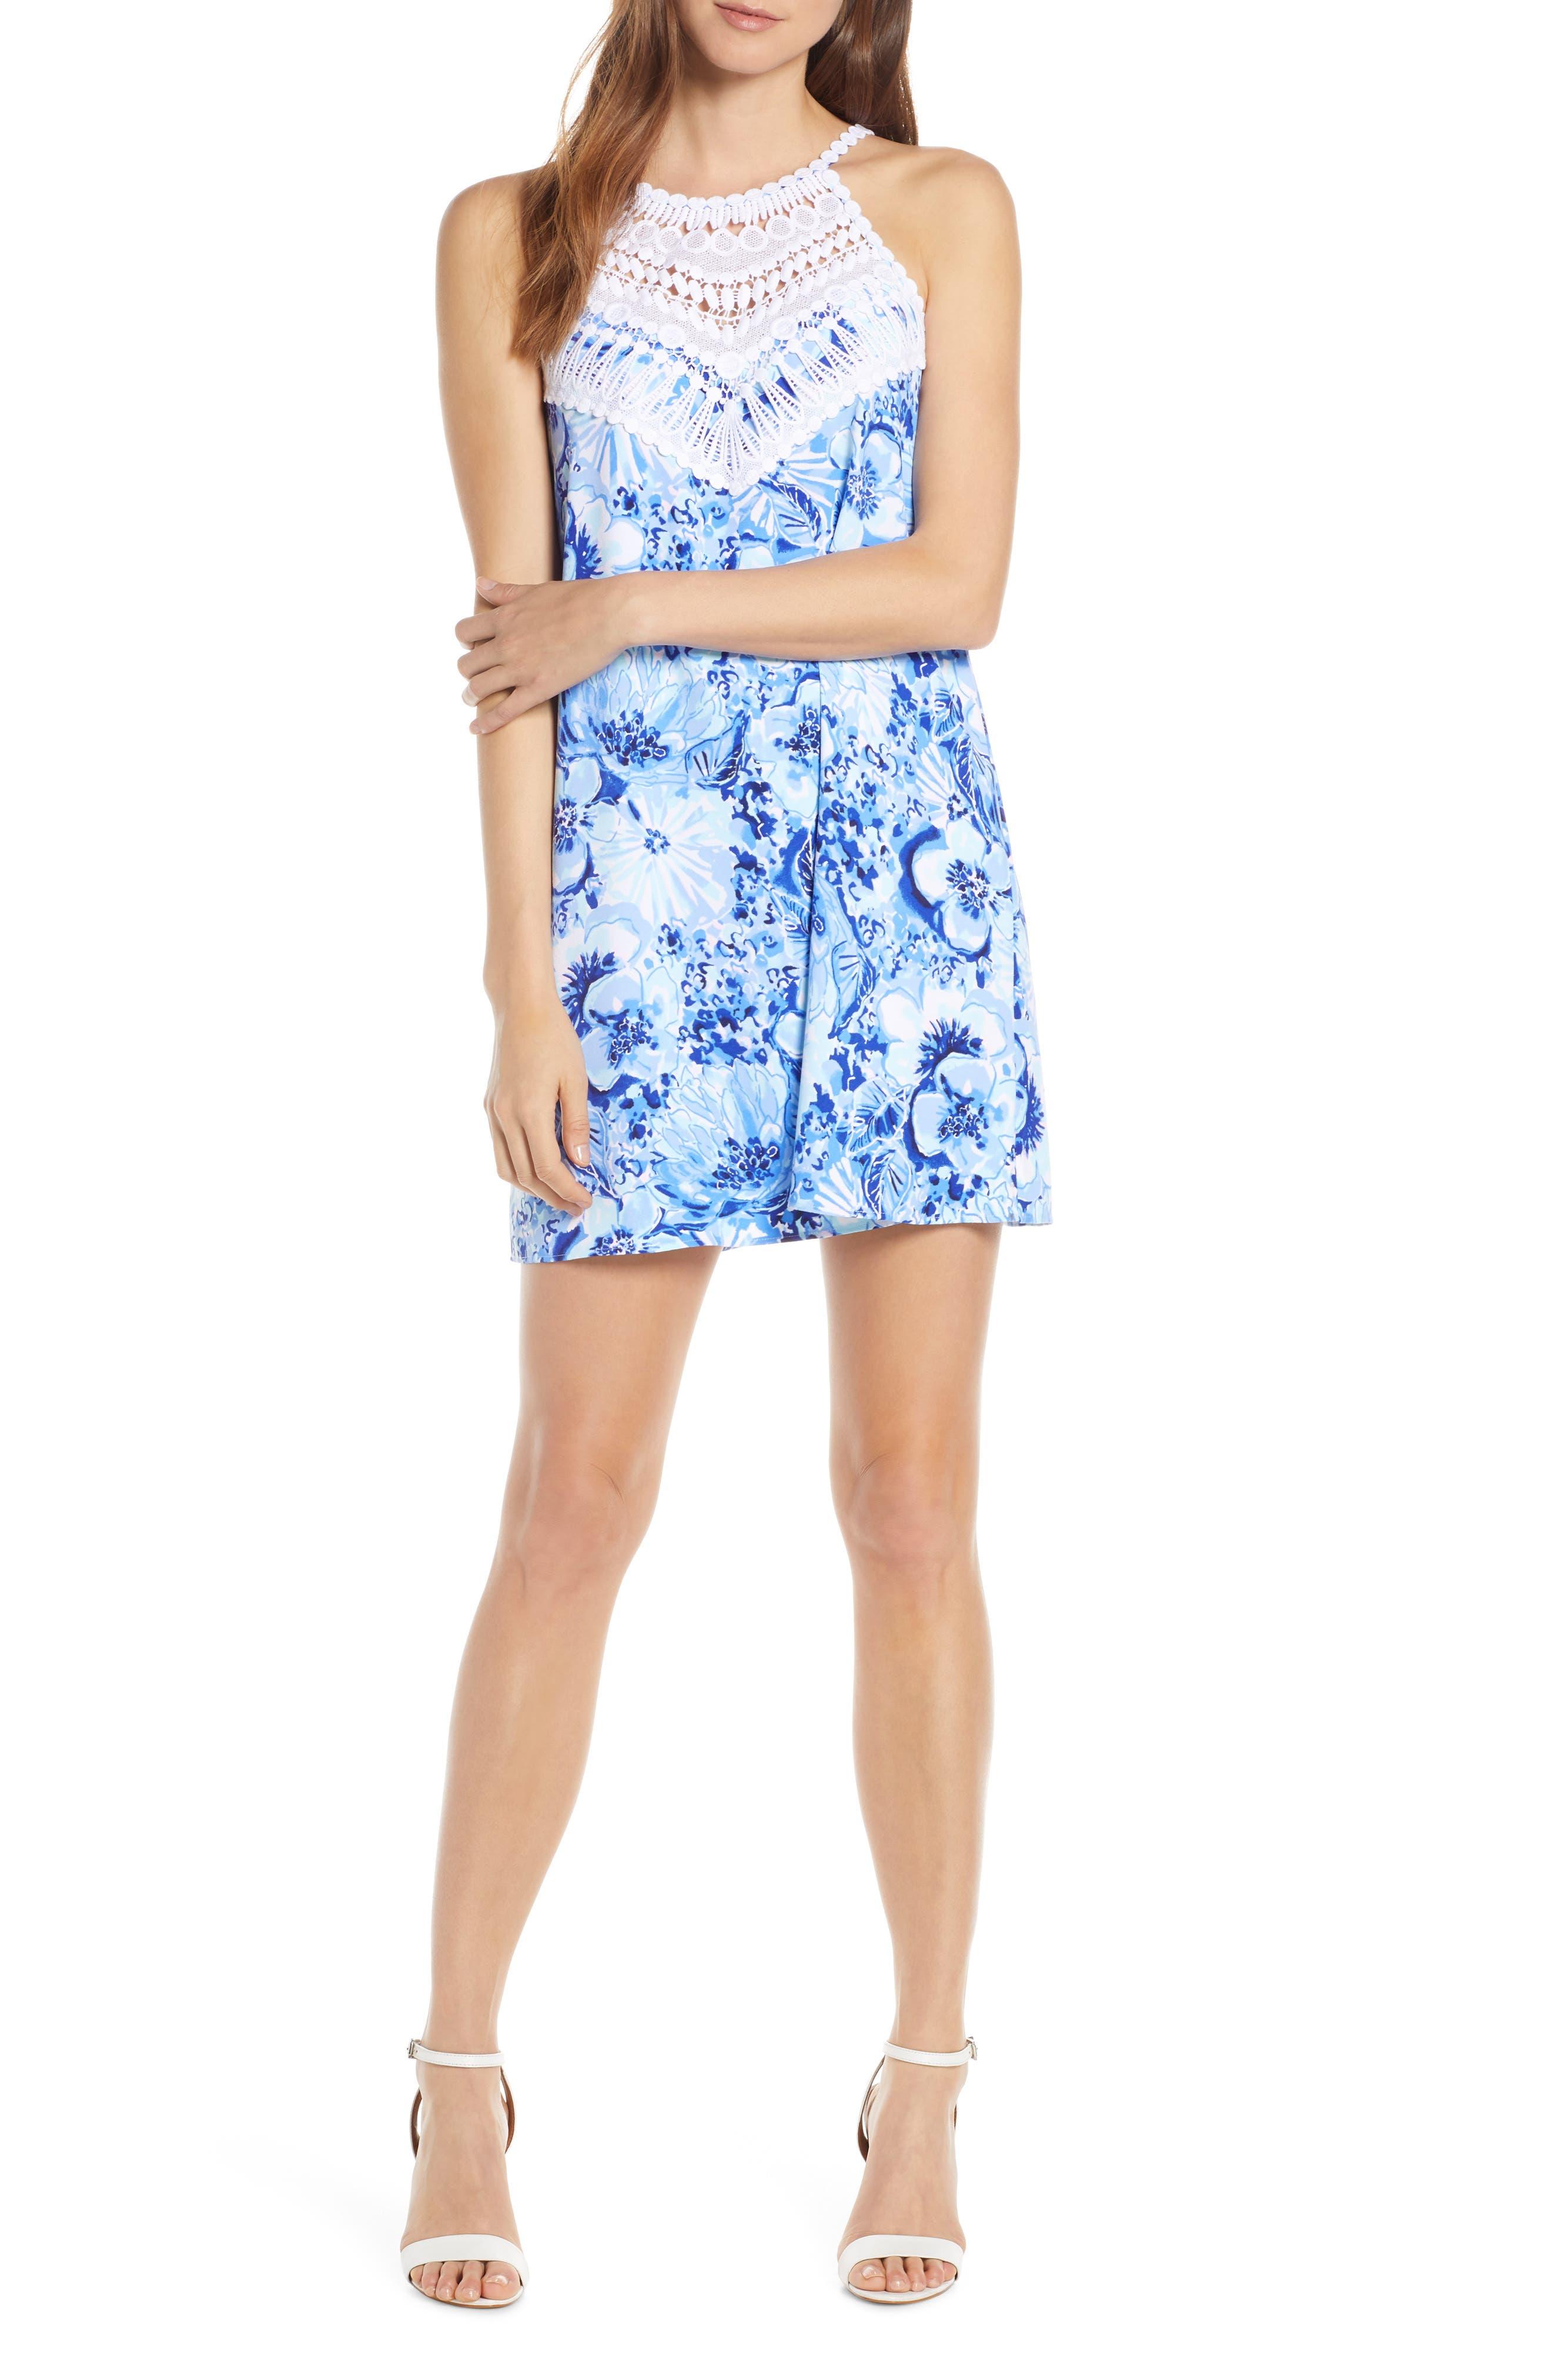 Lilly Pulitzer Printed Sleeveless Shift Dress, Blue